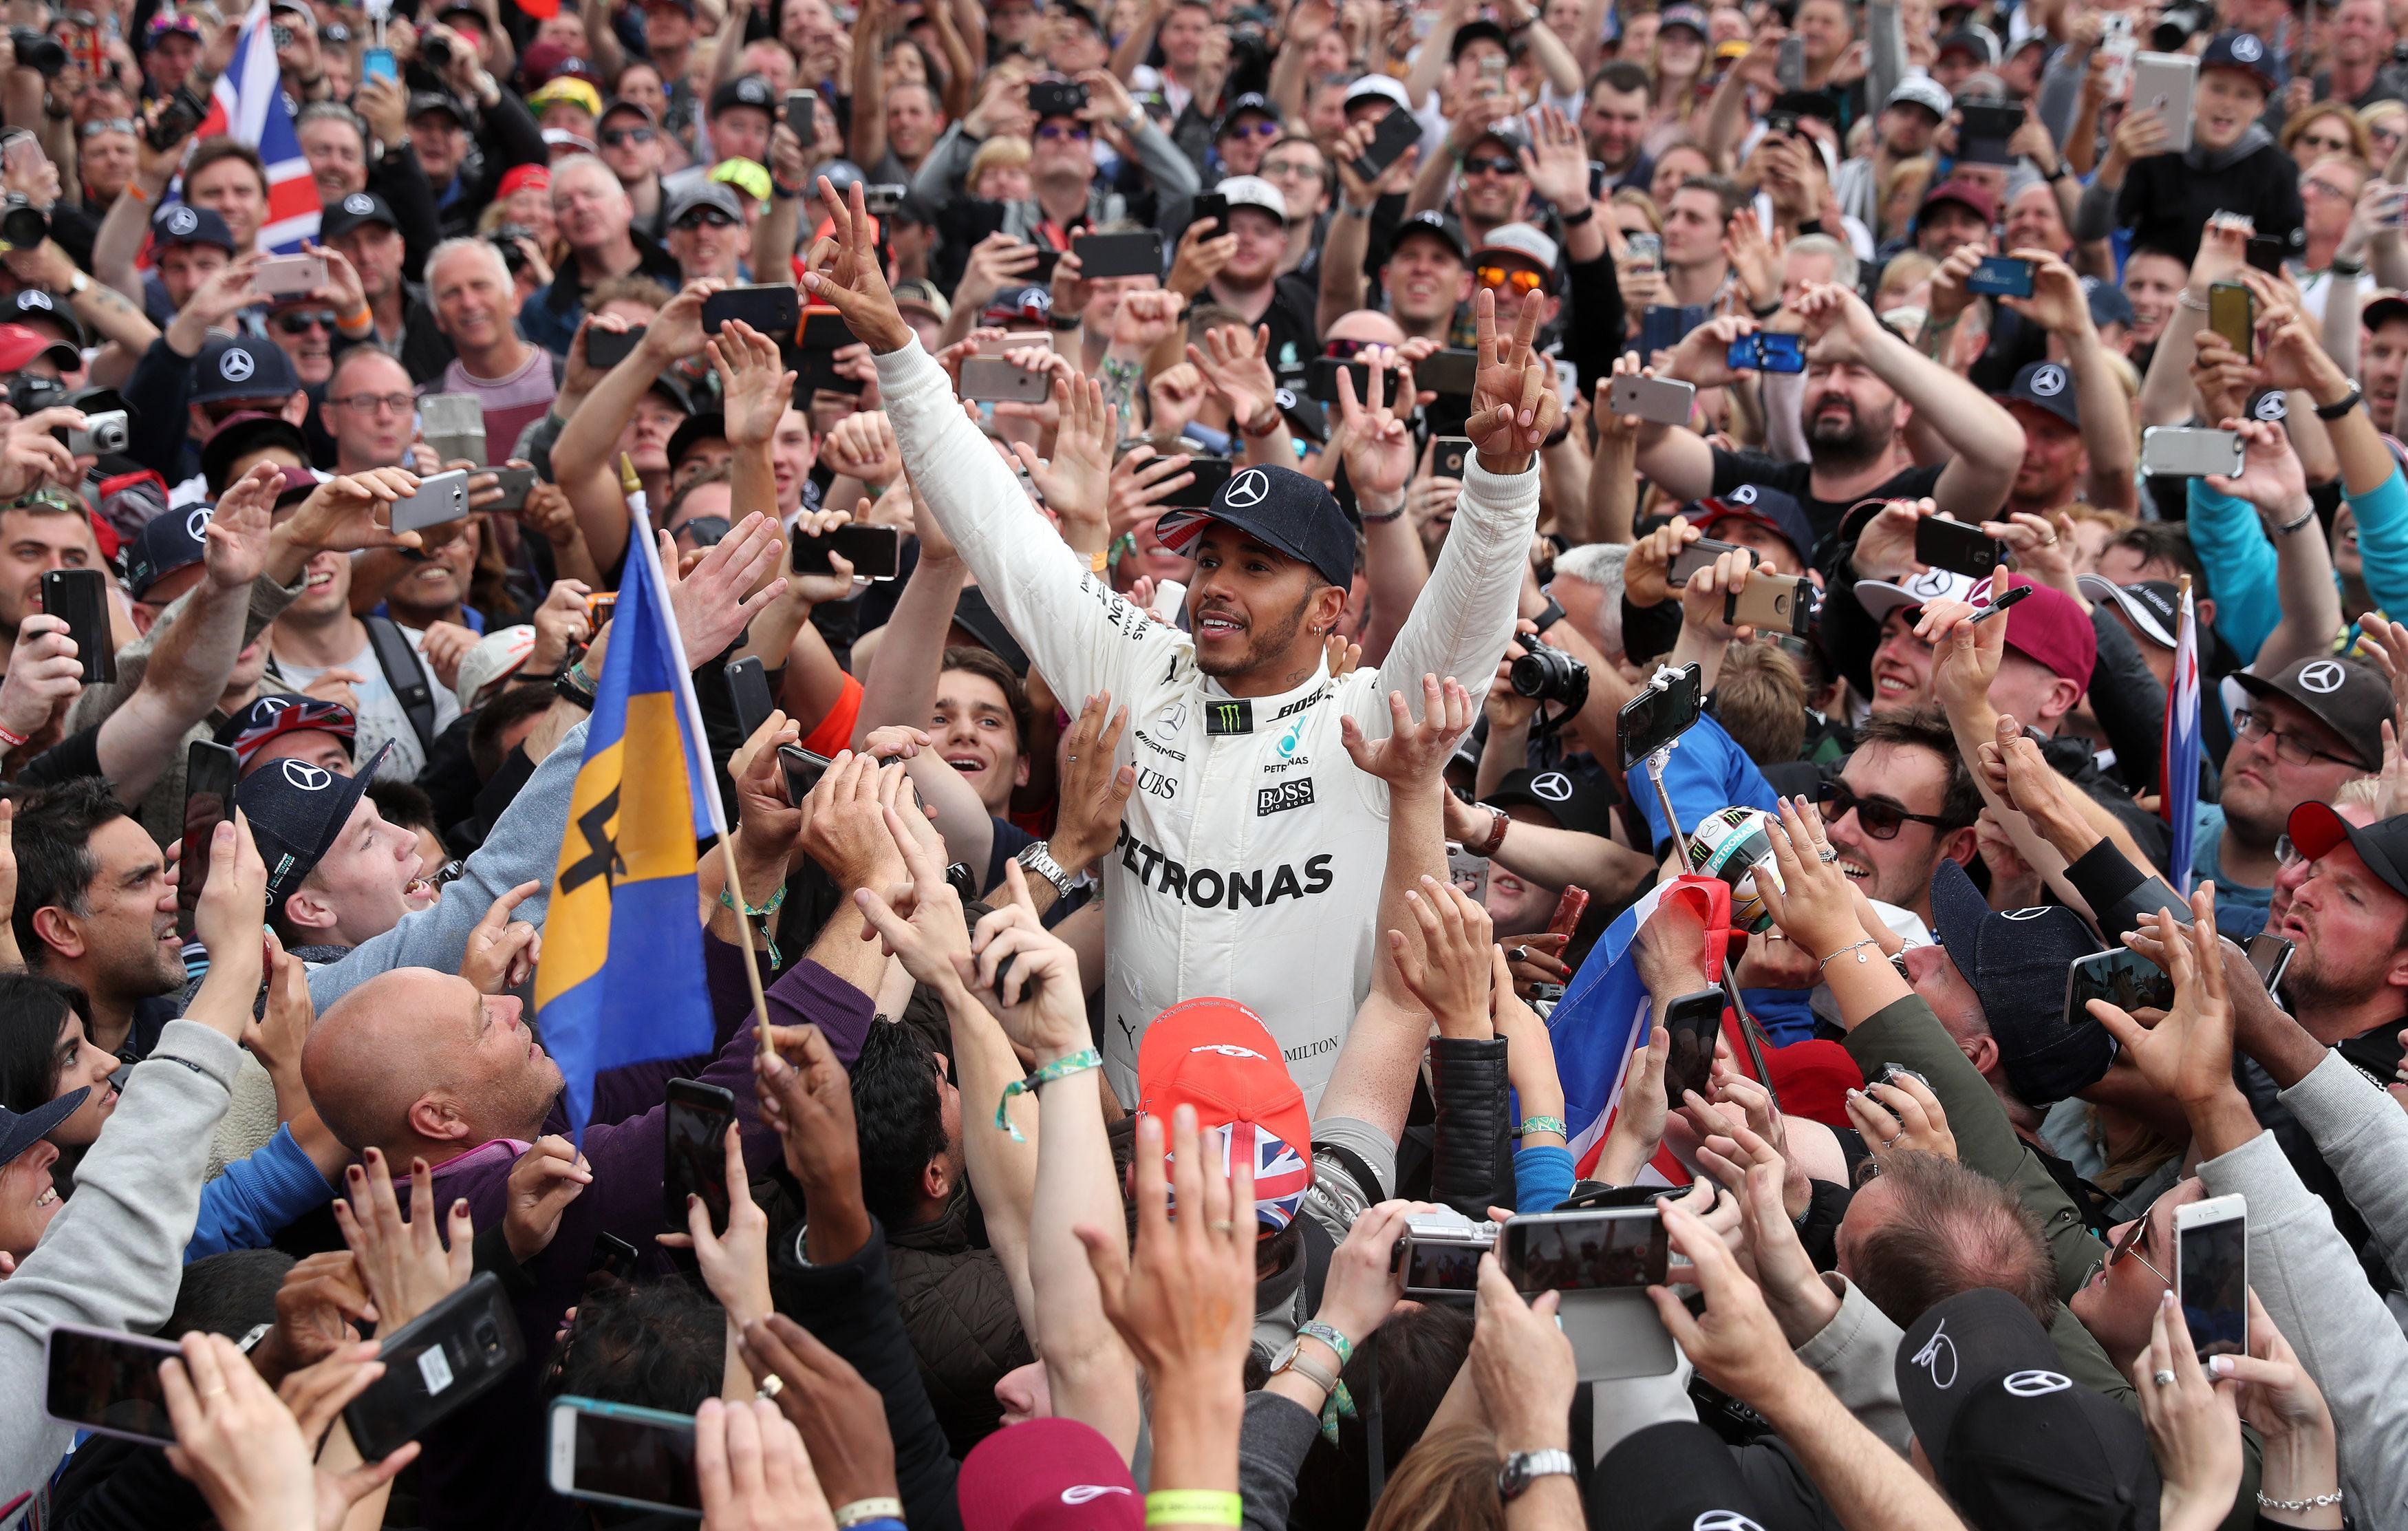 Lewis Hamilton celebrating his victory in the 2017 British Grand Prix at Silverstone